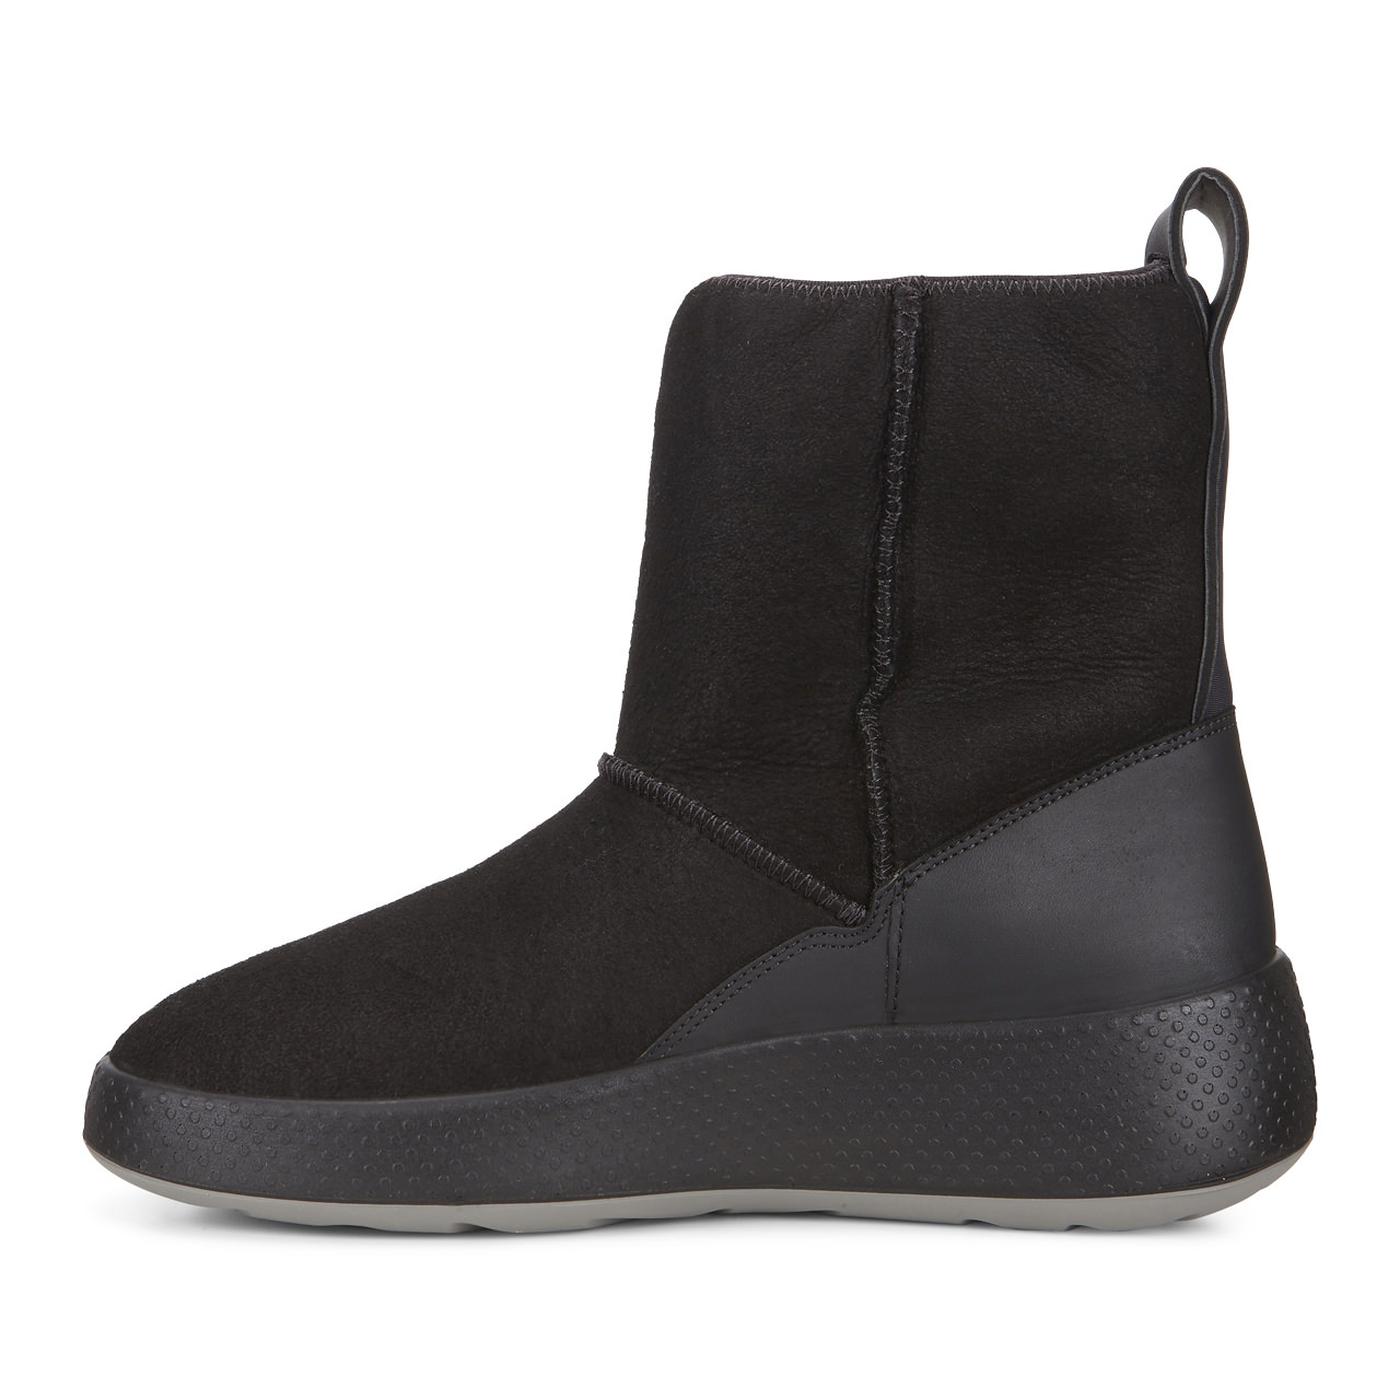 ECCO UKIUK Lamb Skin Short Boot